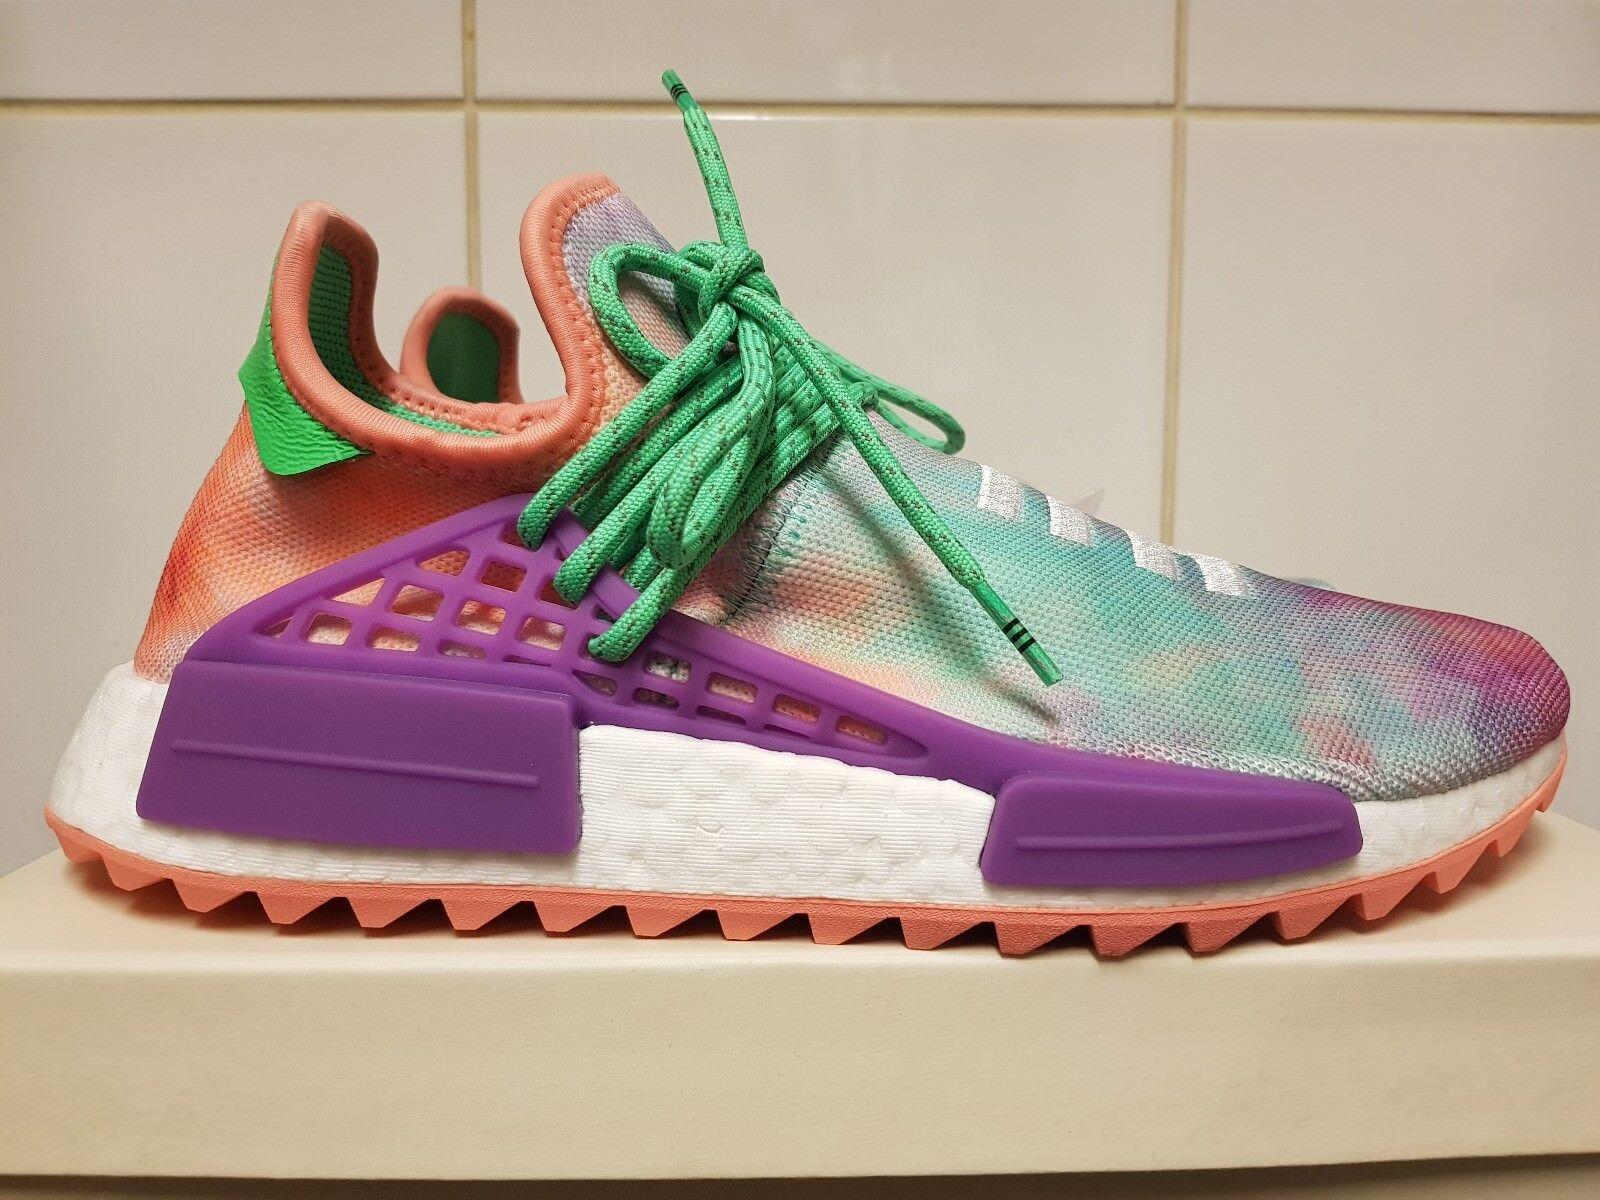 b92099c91 adidas X Pharrell Williams HU Holi NMD Chalk Coral UK 9 in Hand for ...